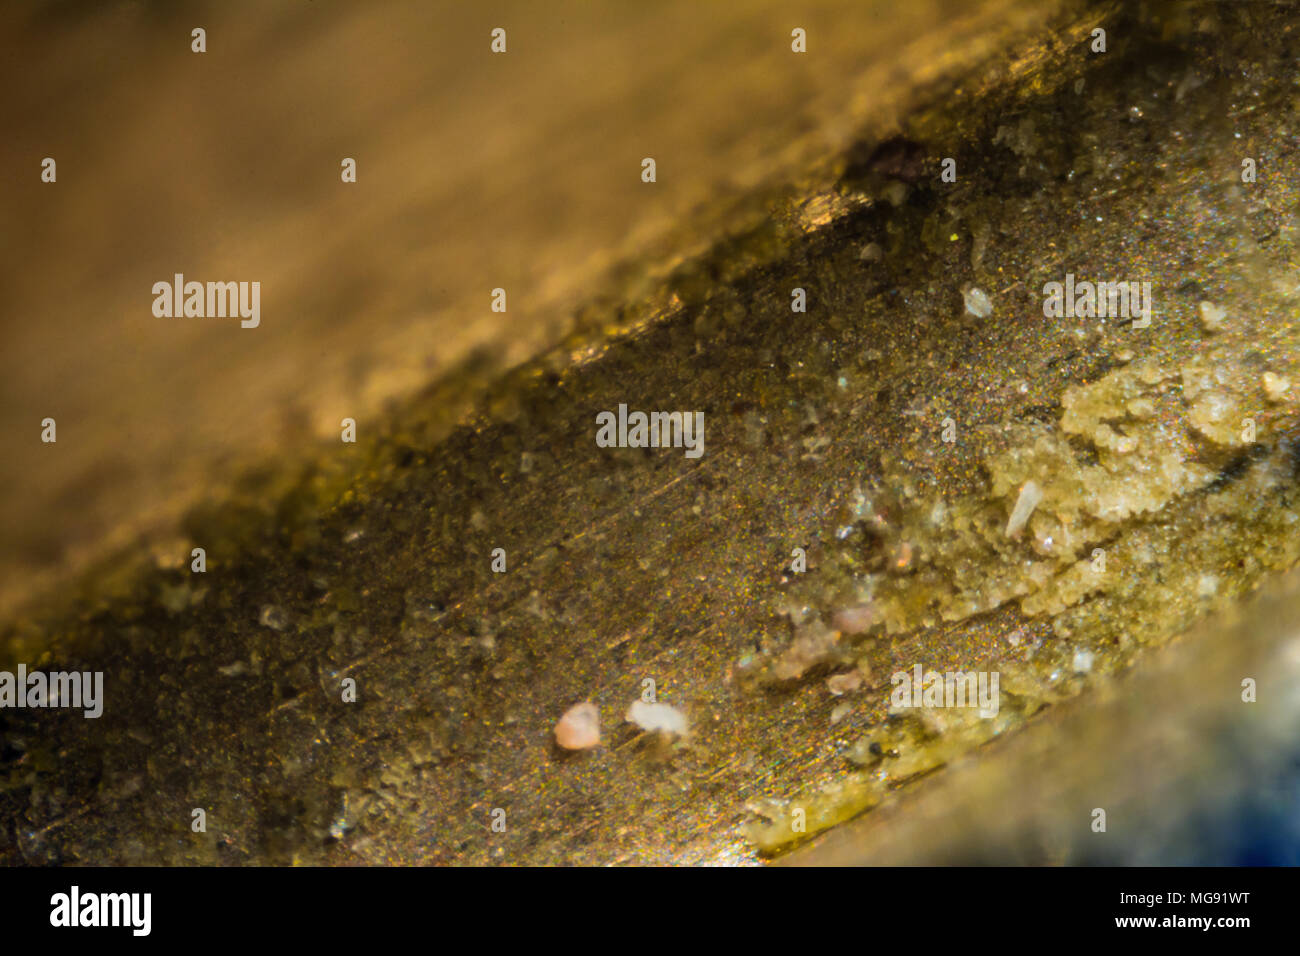 Metal key surface under the microscope. Closeup macro photography. - Stock Image